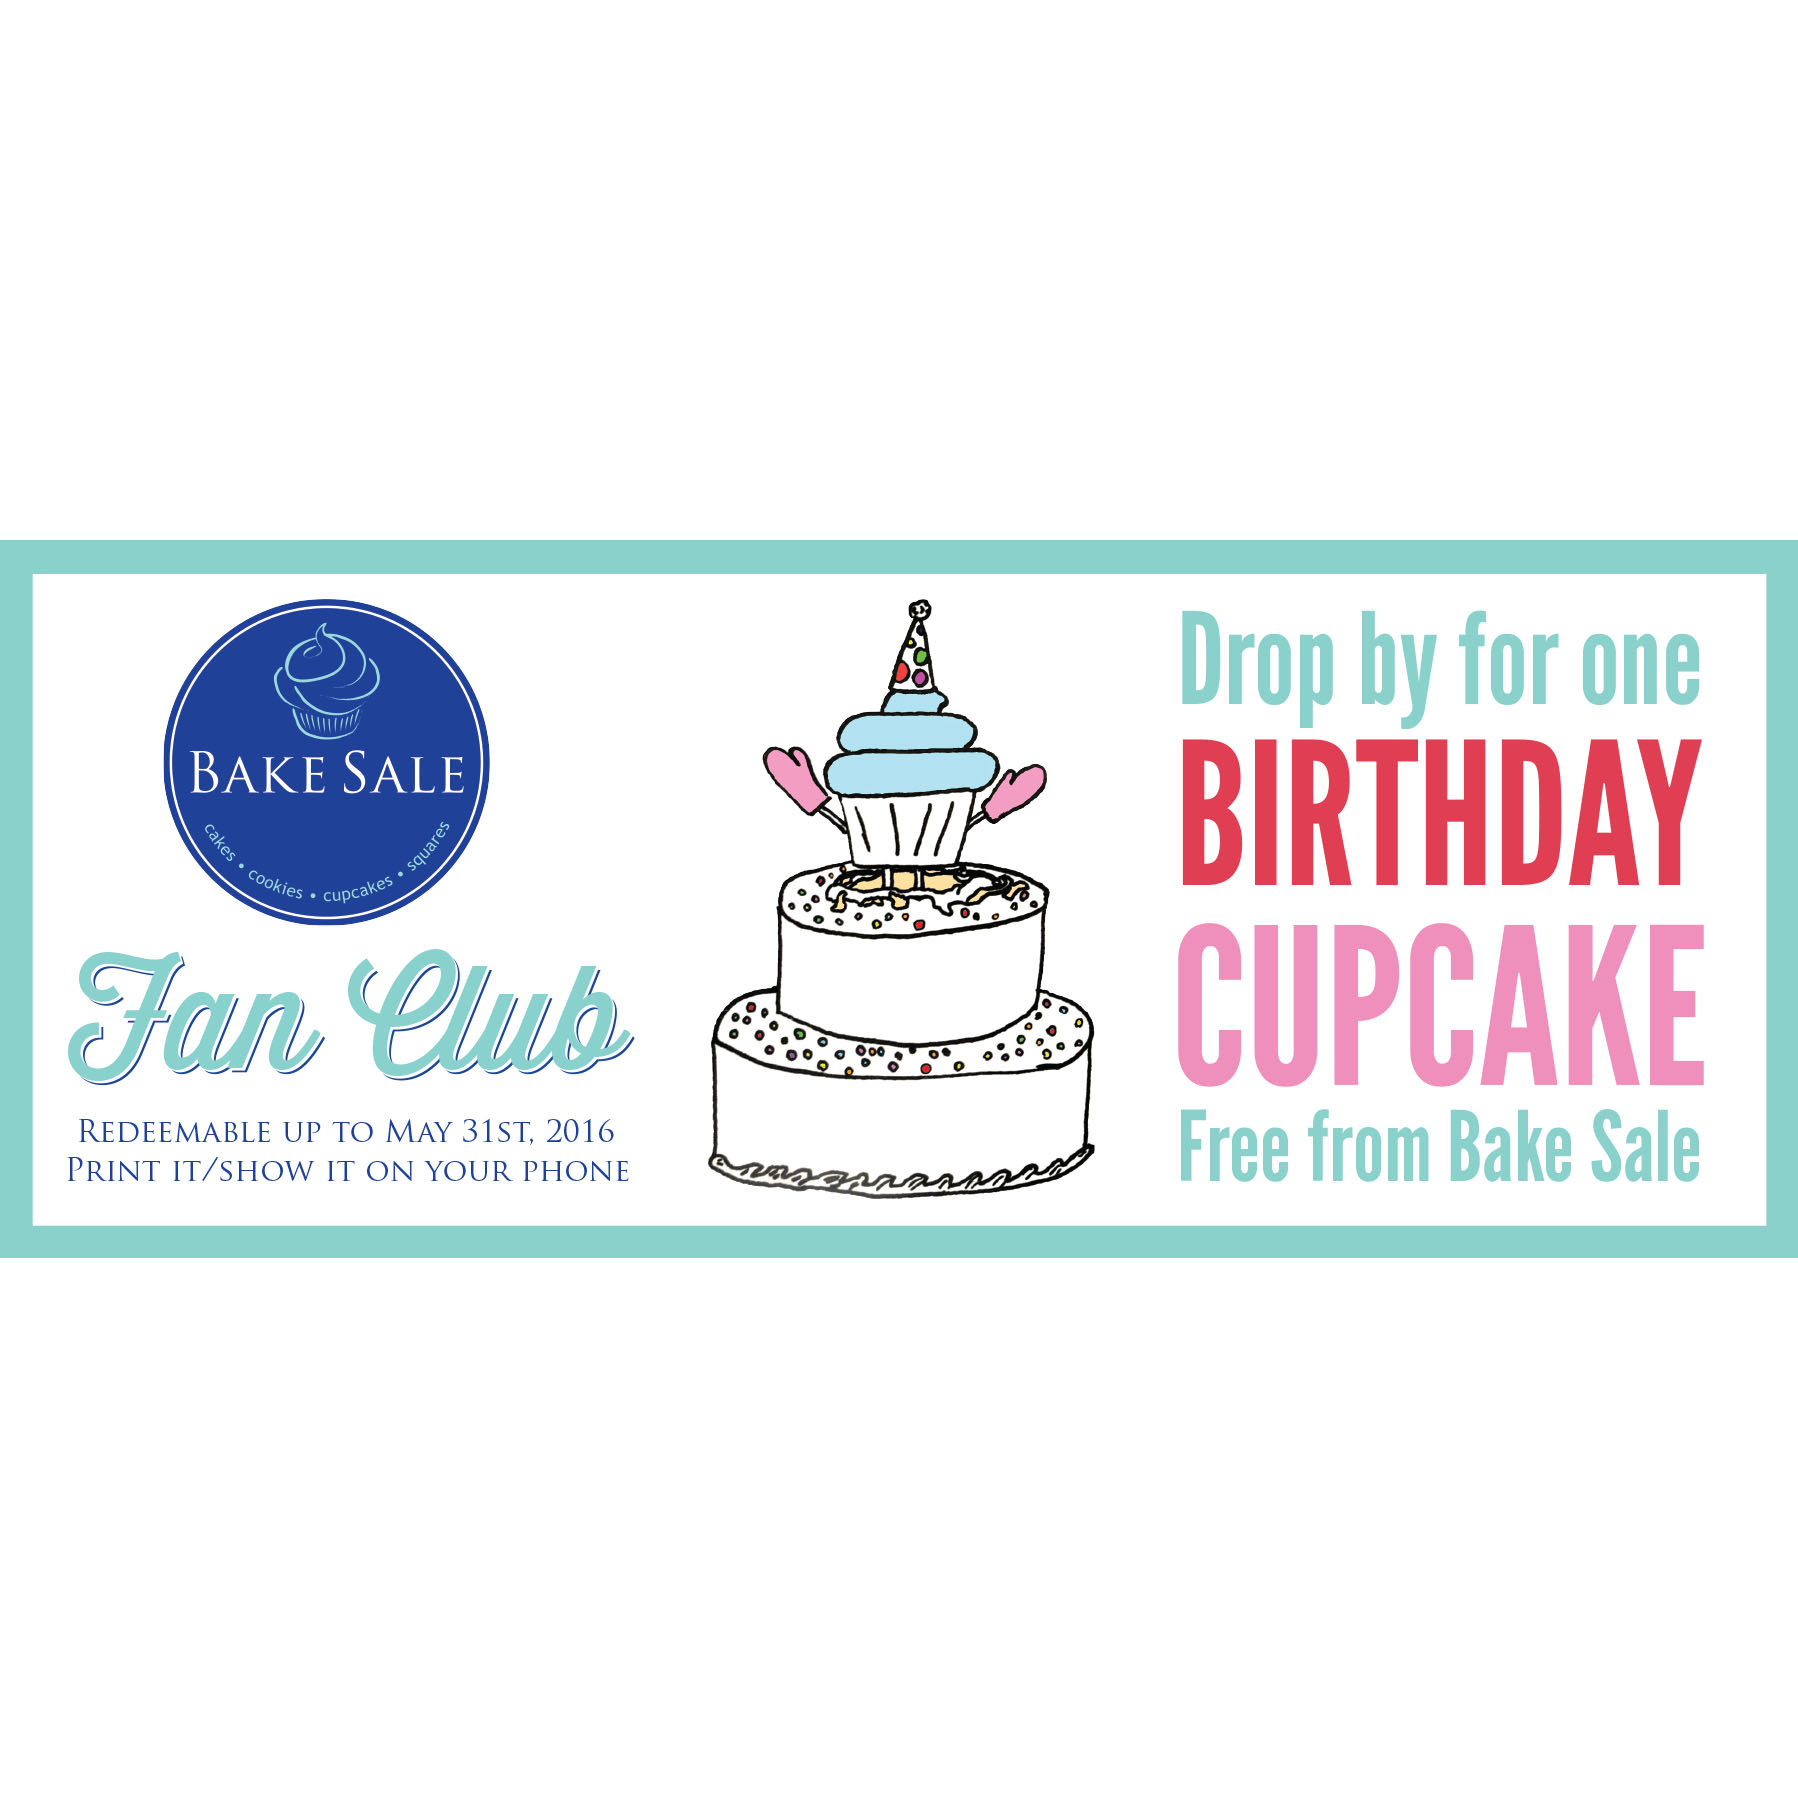 Bake Sale Fan Club April Birthday Coupon Round 2.jpg